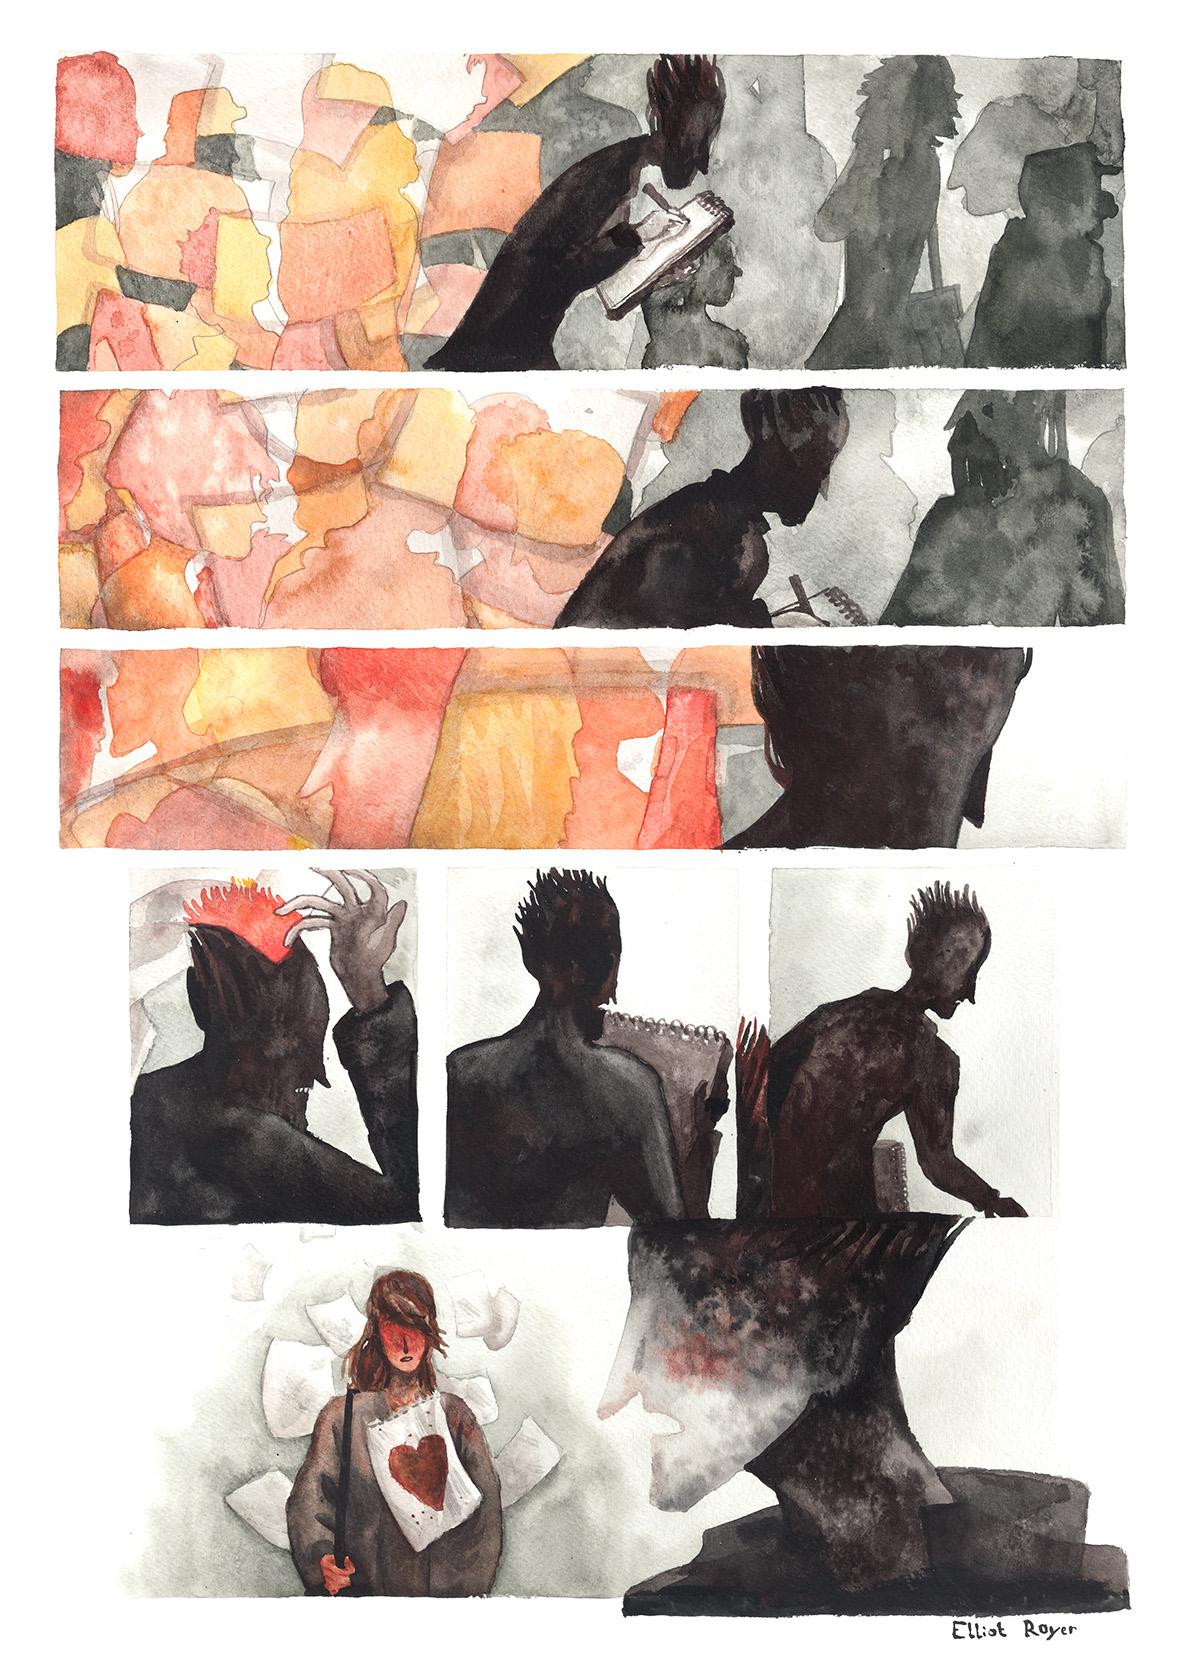 http://orig14.deviantart.net/31e8/f/2016/087/3/1/bd___dessins_jetes_2_by_harukoossoko-d9wtgu2.jpg